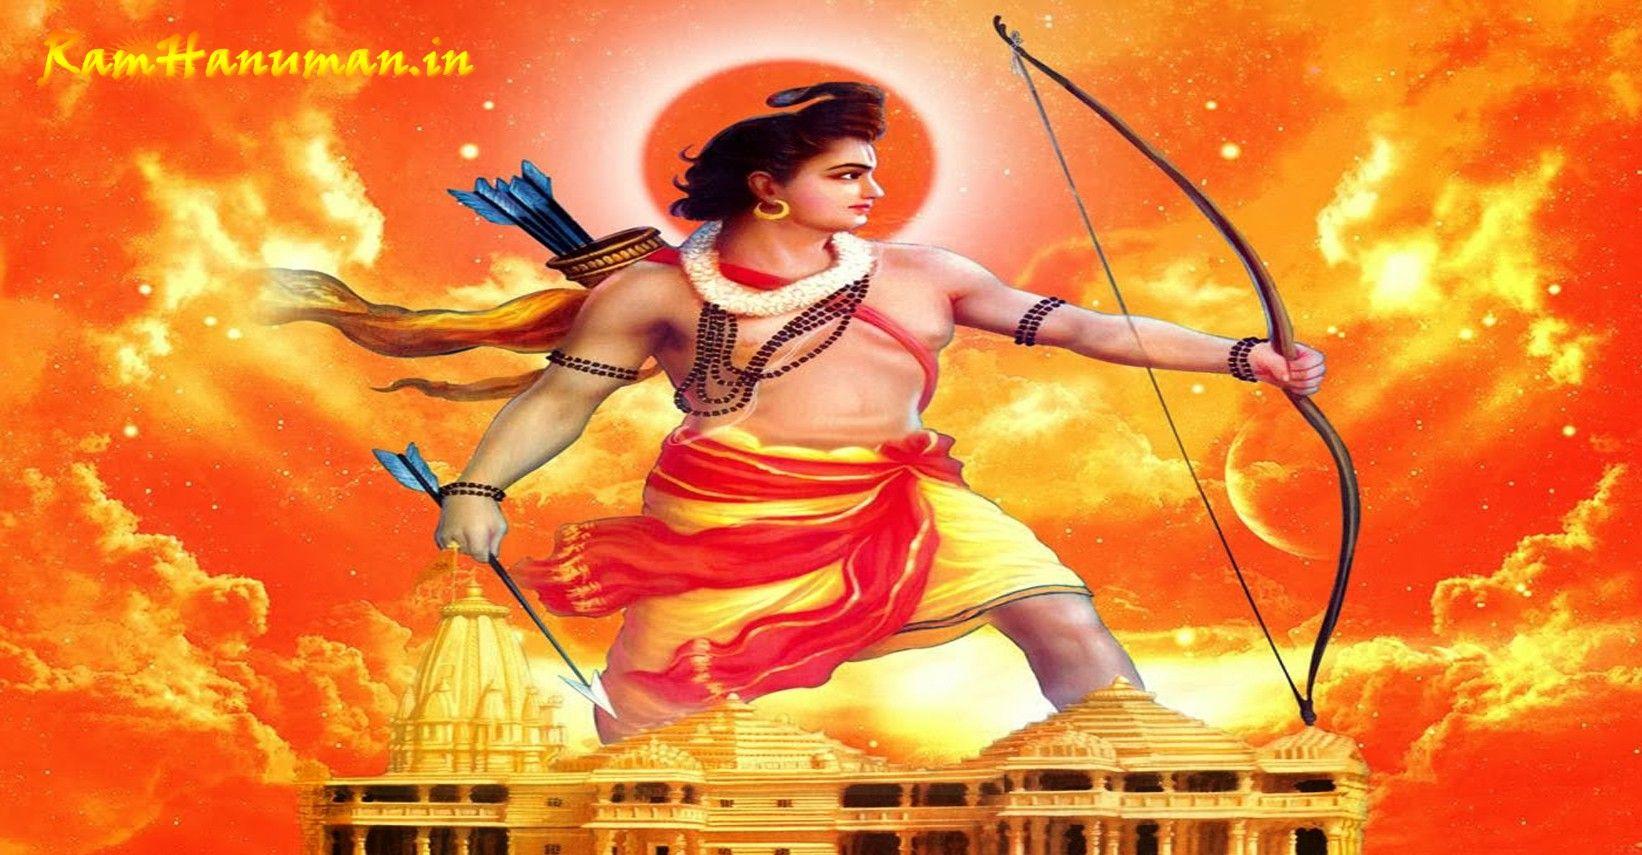 Hd wallpaper jai shri ram - Jai Shree Ram Photos Images Hd Wallpaper Download 800 600 Ram Wallpapers 48